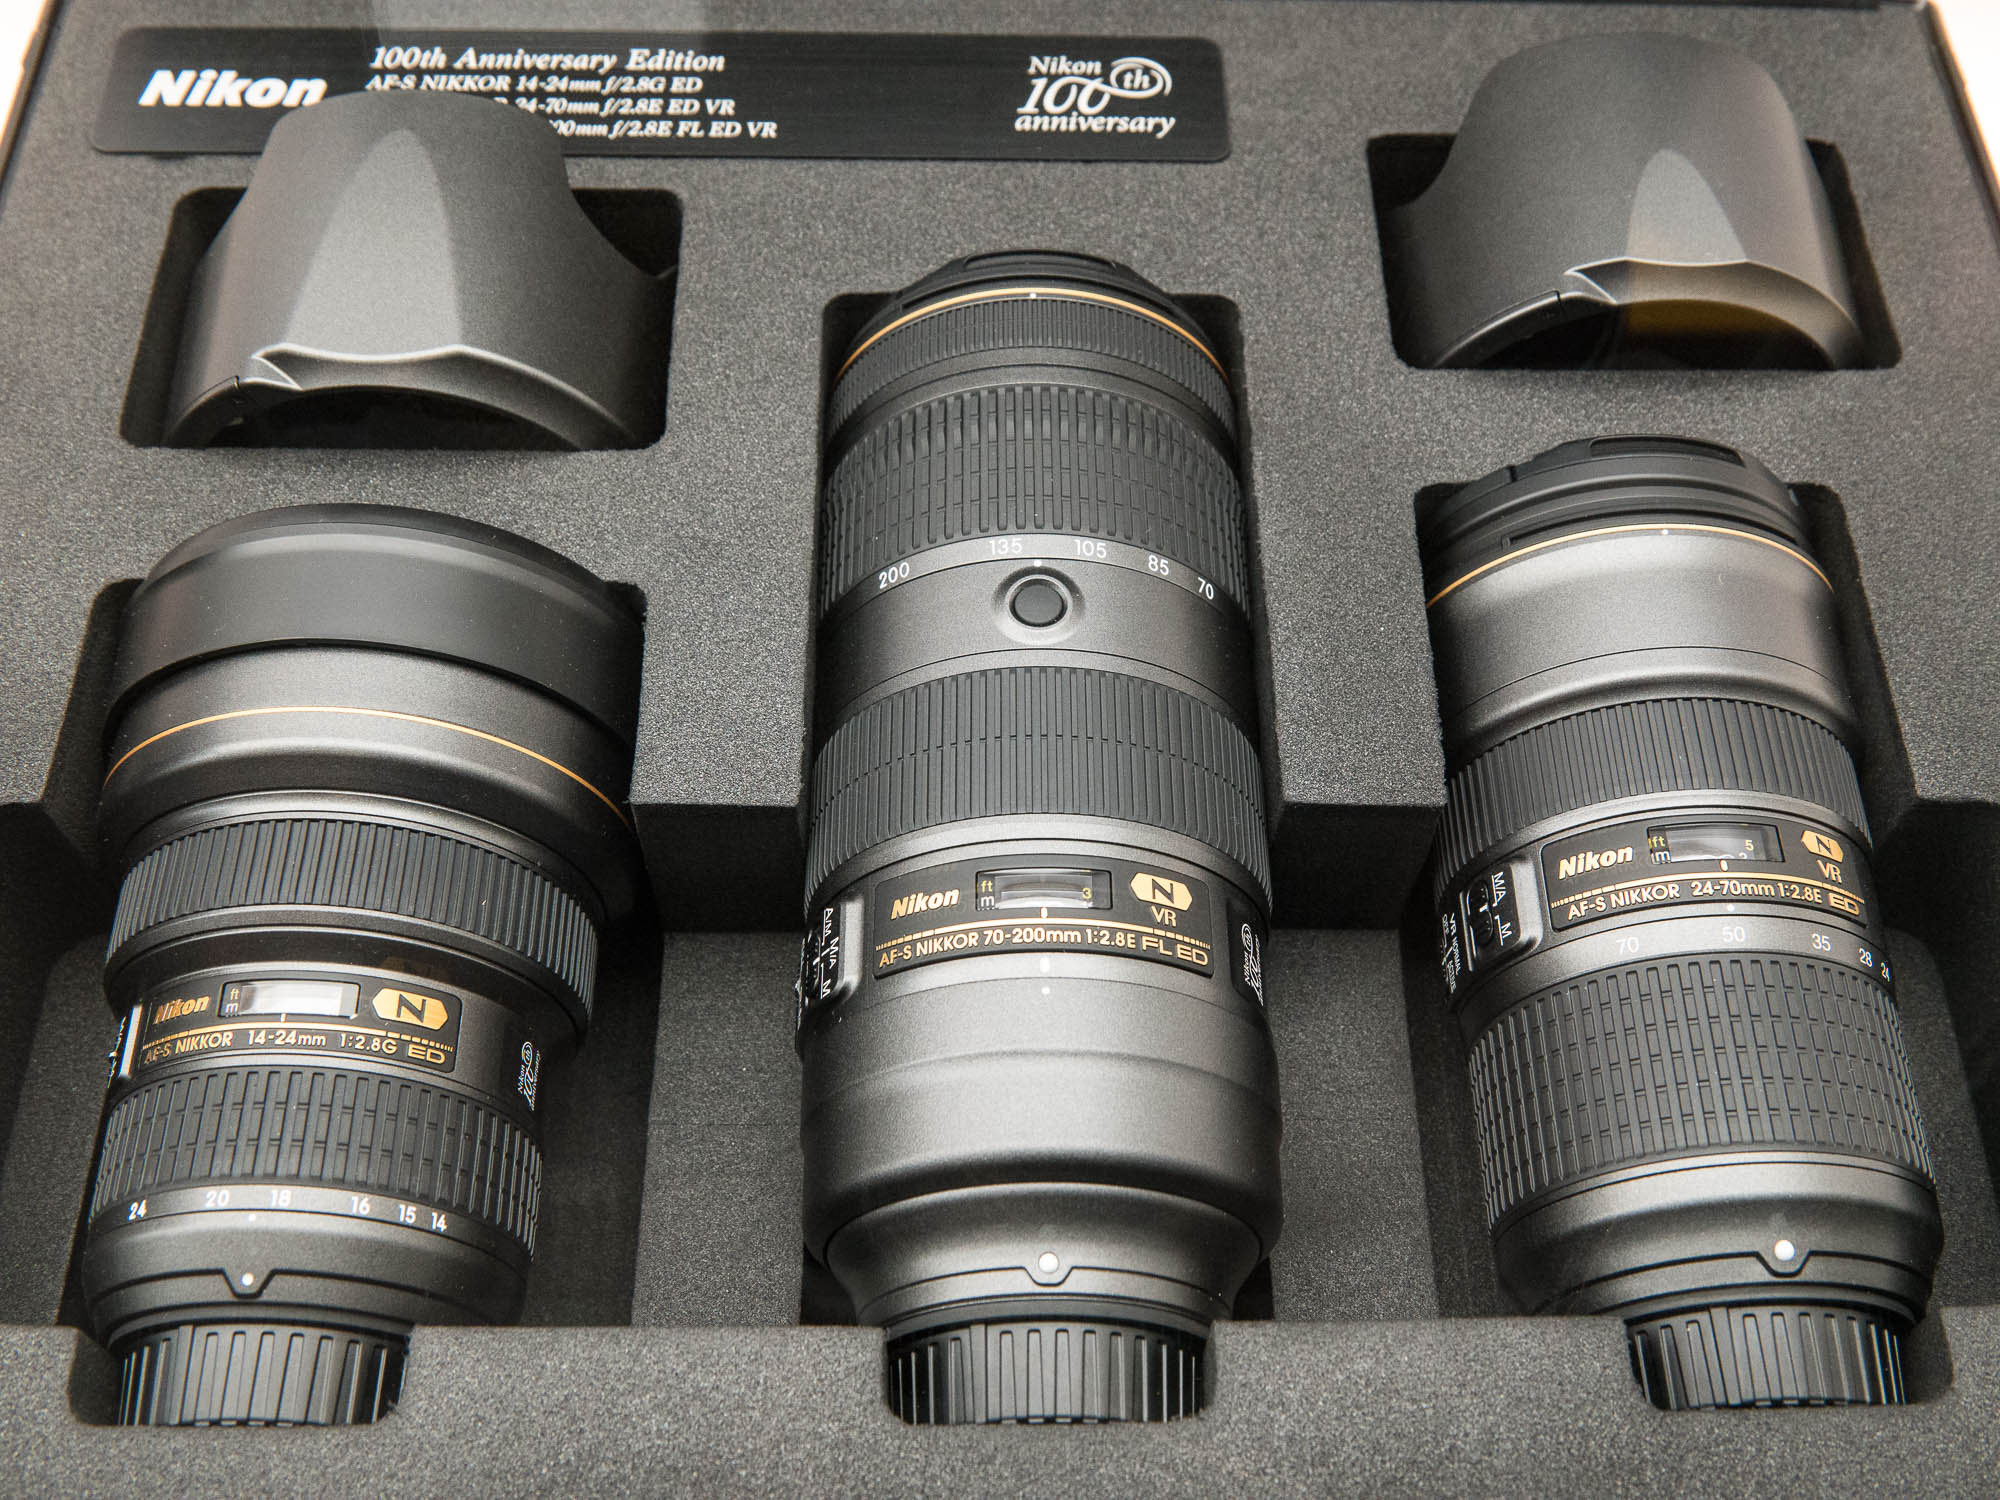 nikon_100years-lenses.jpeg